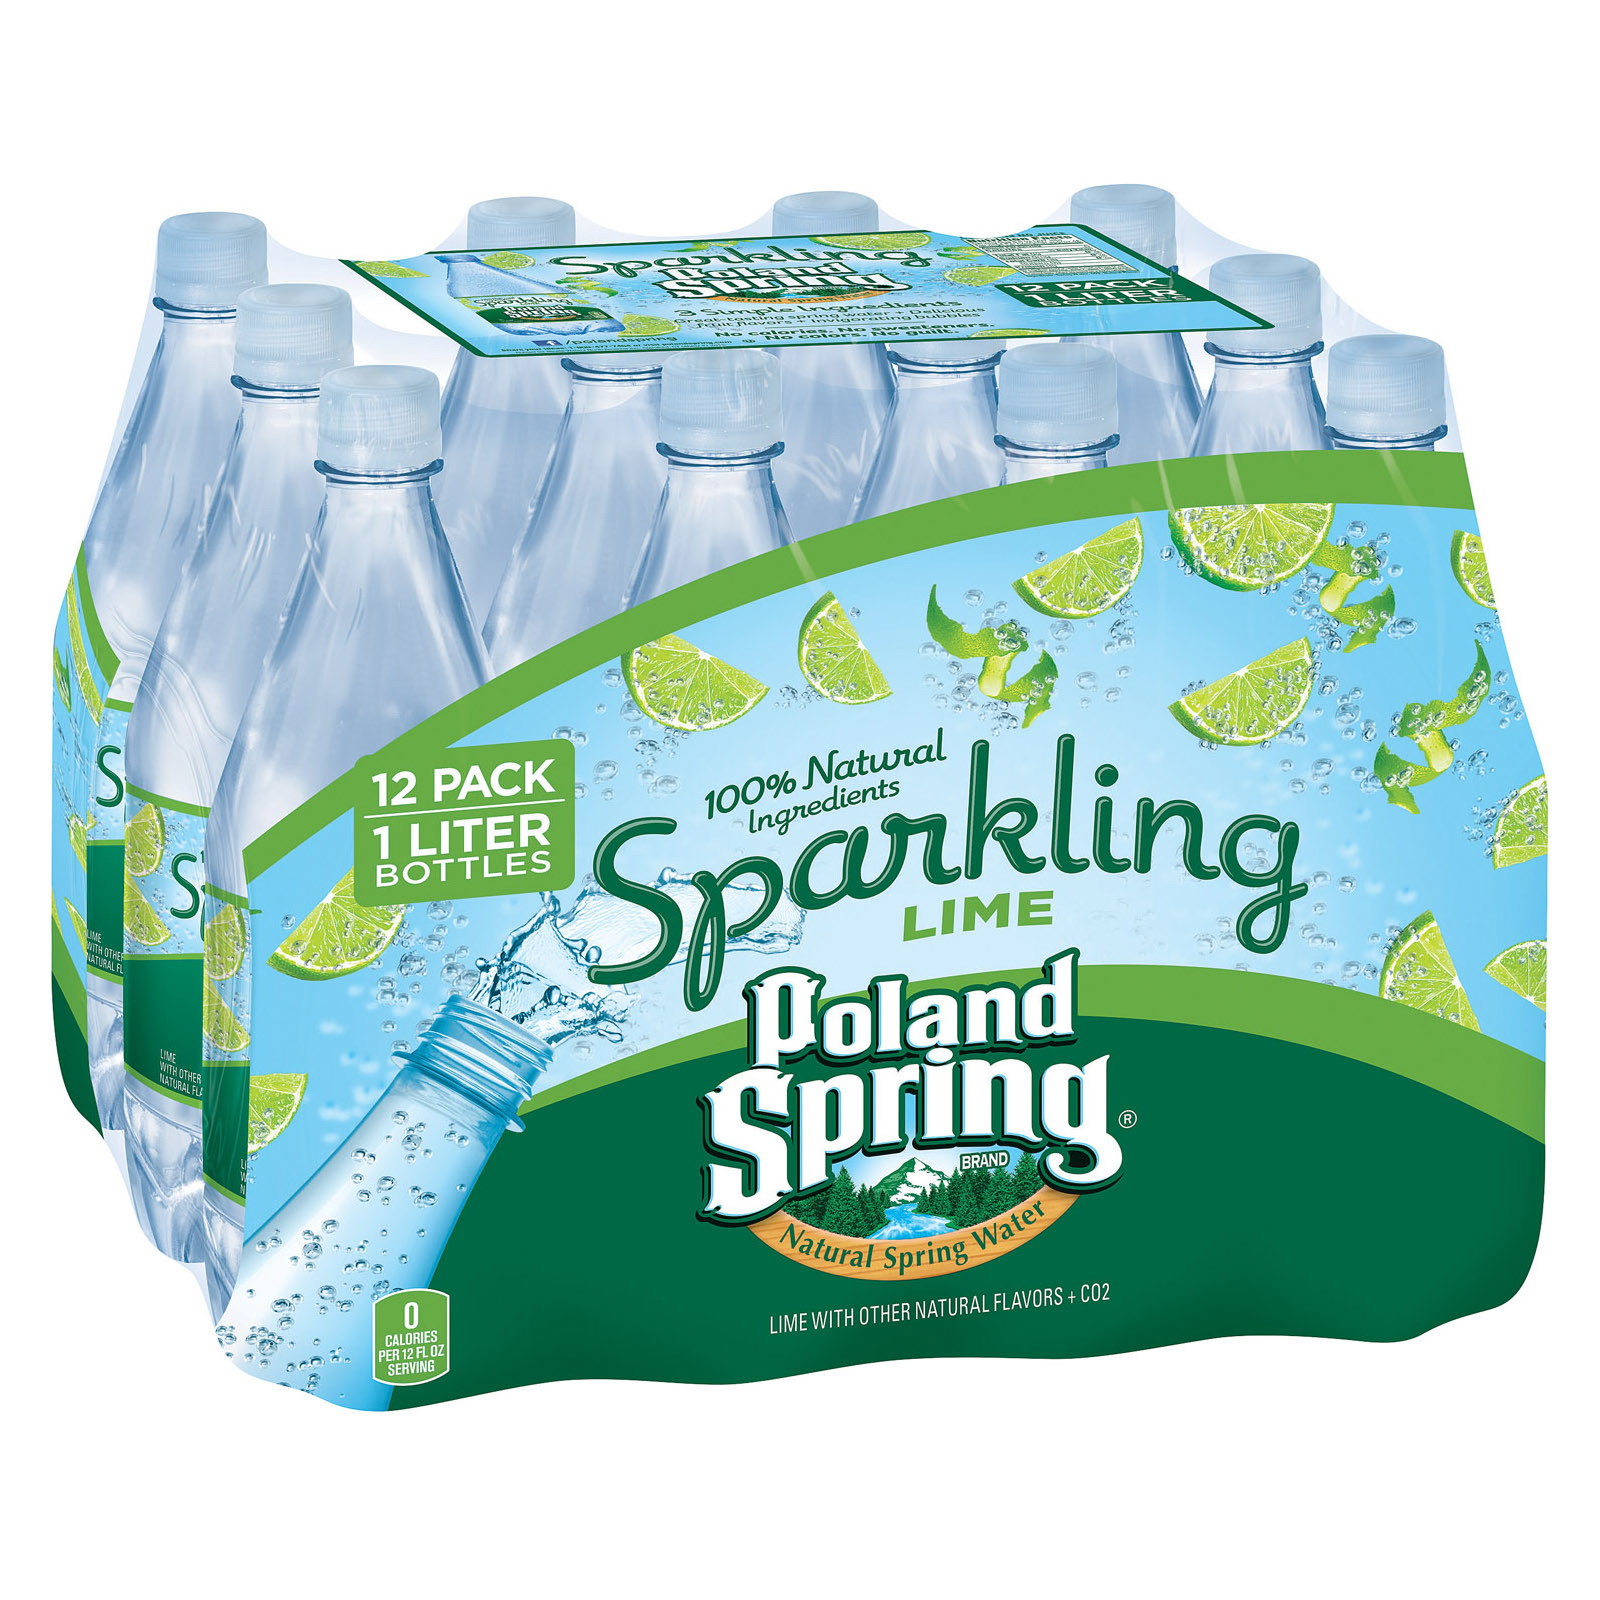 Poland Spring Sparkling Water - Lime - Case of 12 - 33.8 Fl oz.